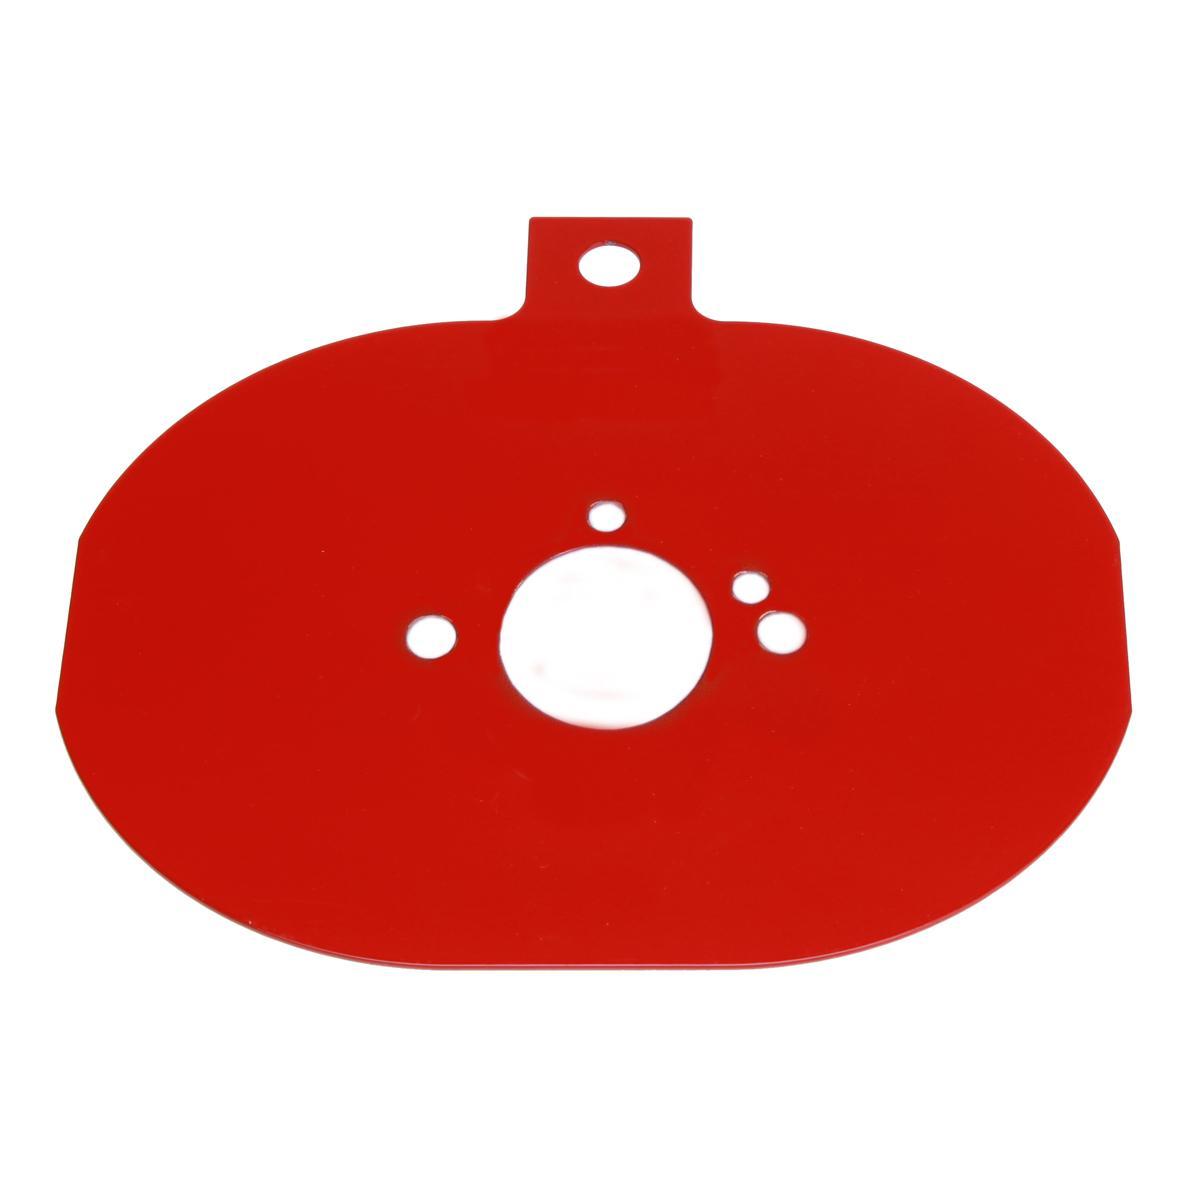 Itg jc20 baseplate 23jc20 from merlin motorsport for Motor base plate design